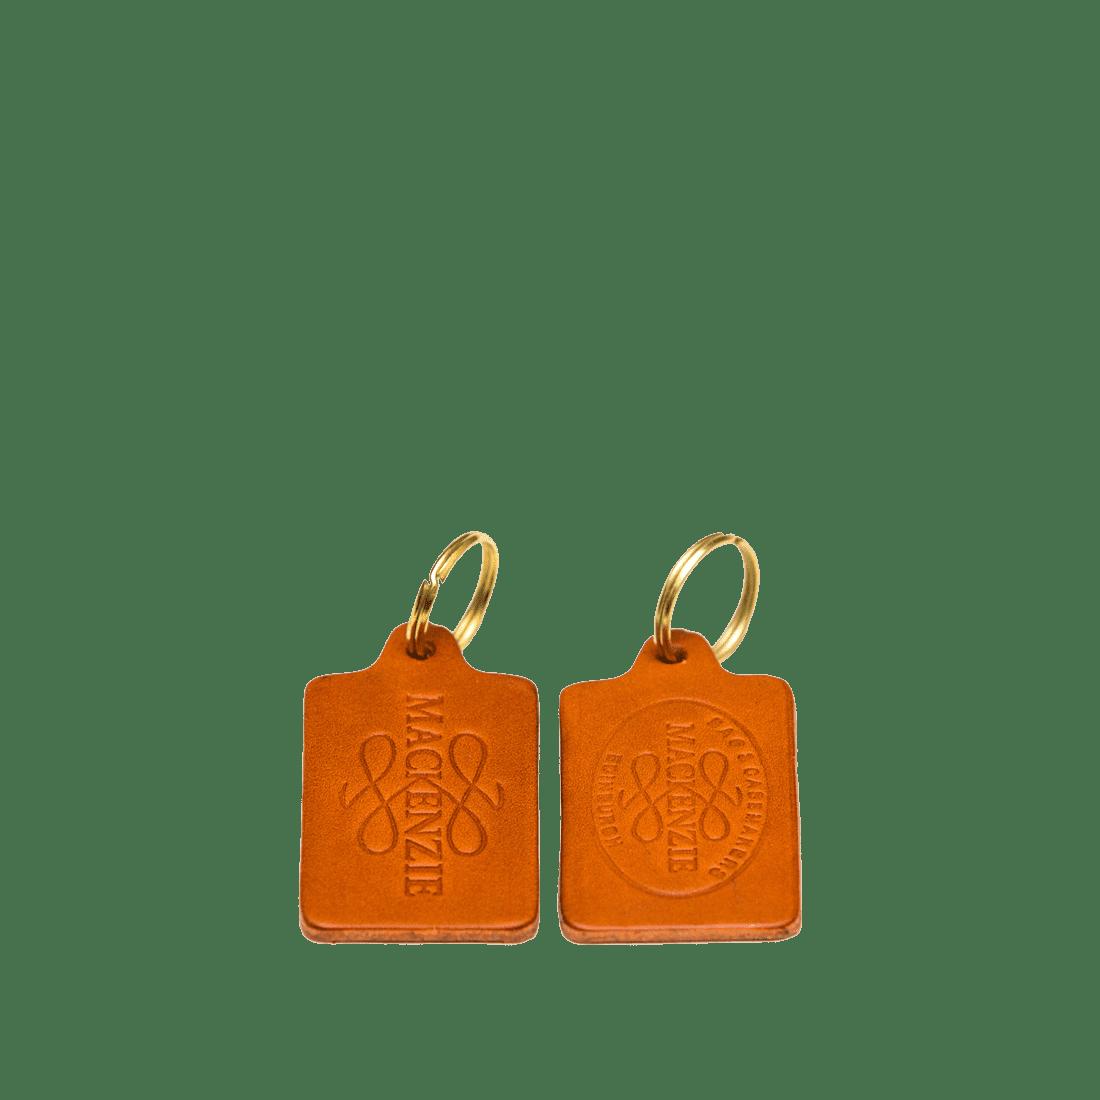 The key ring London tan